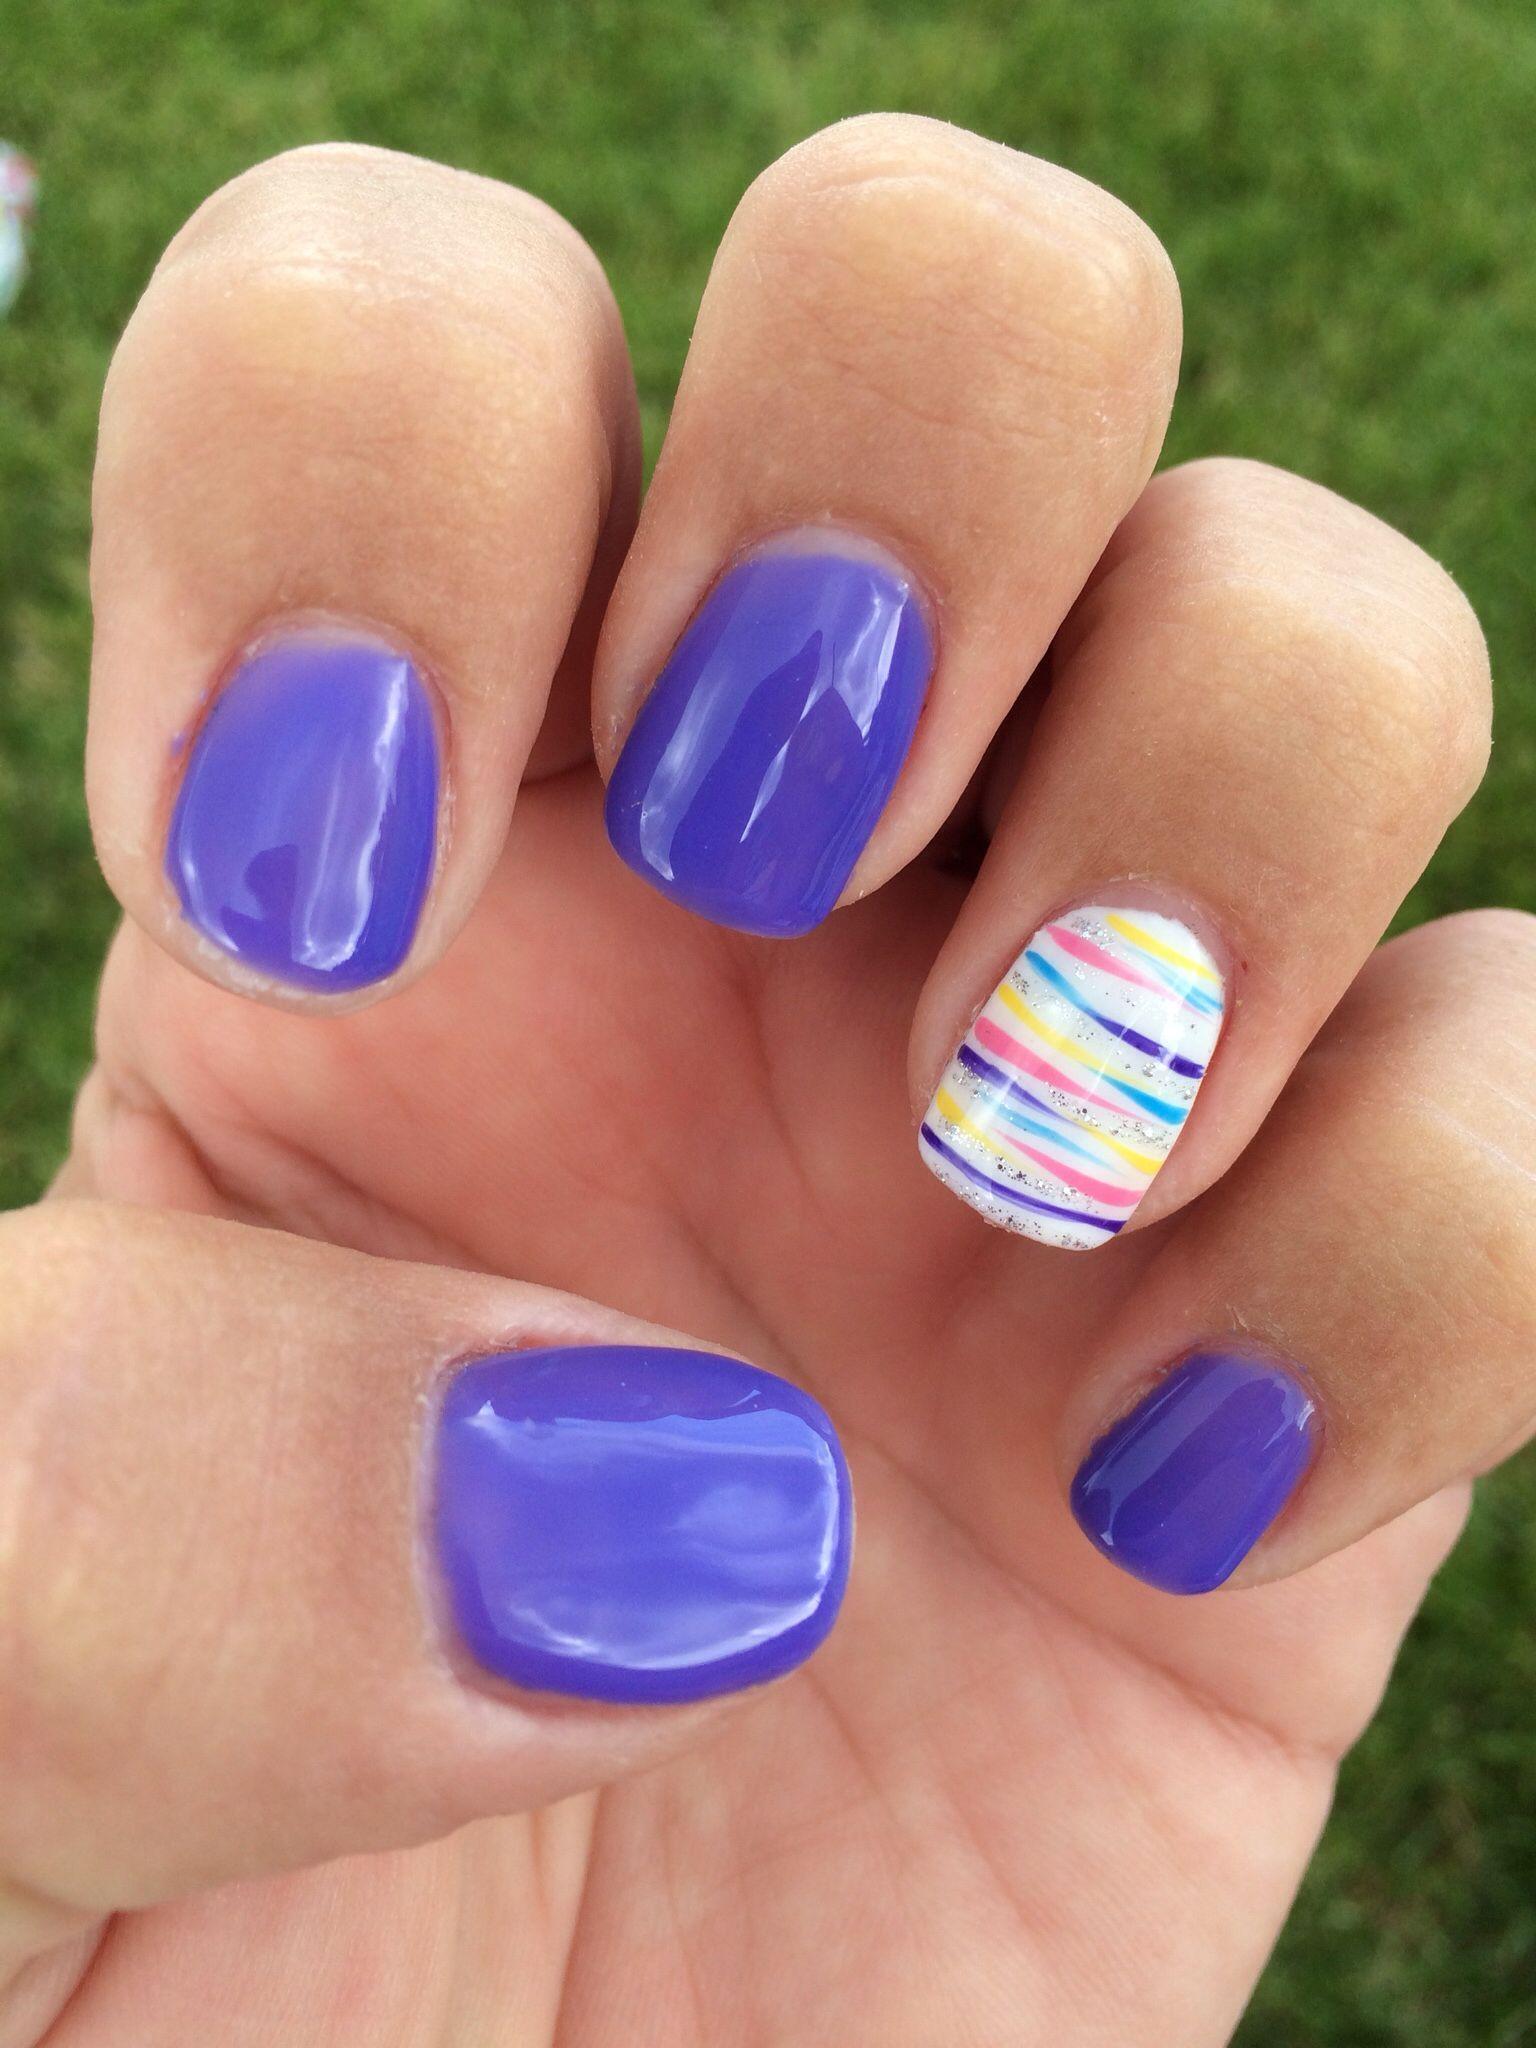 Purple striped summer gel nails Summer Manicure Designs, Pedicure Ideas  Summer, Cute Summer Nail - Purple Striped Summer Gel Nails Beauty & Styles In 2018